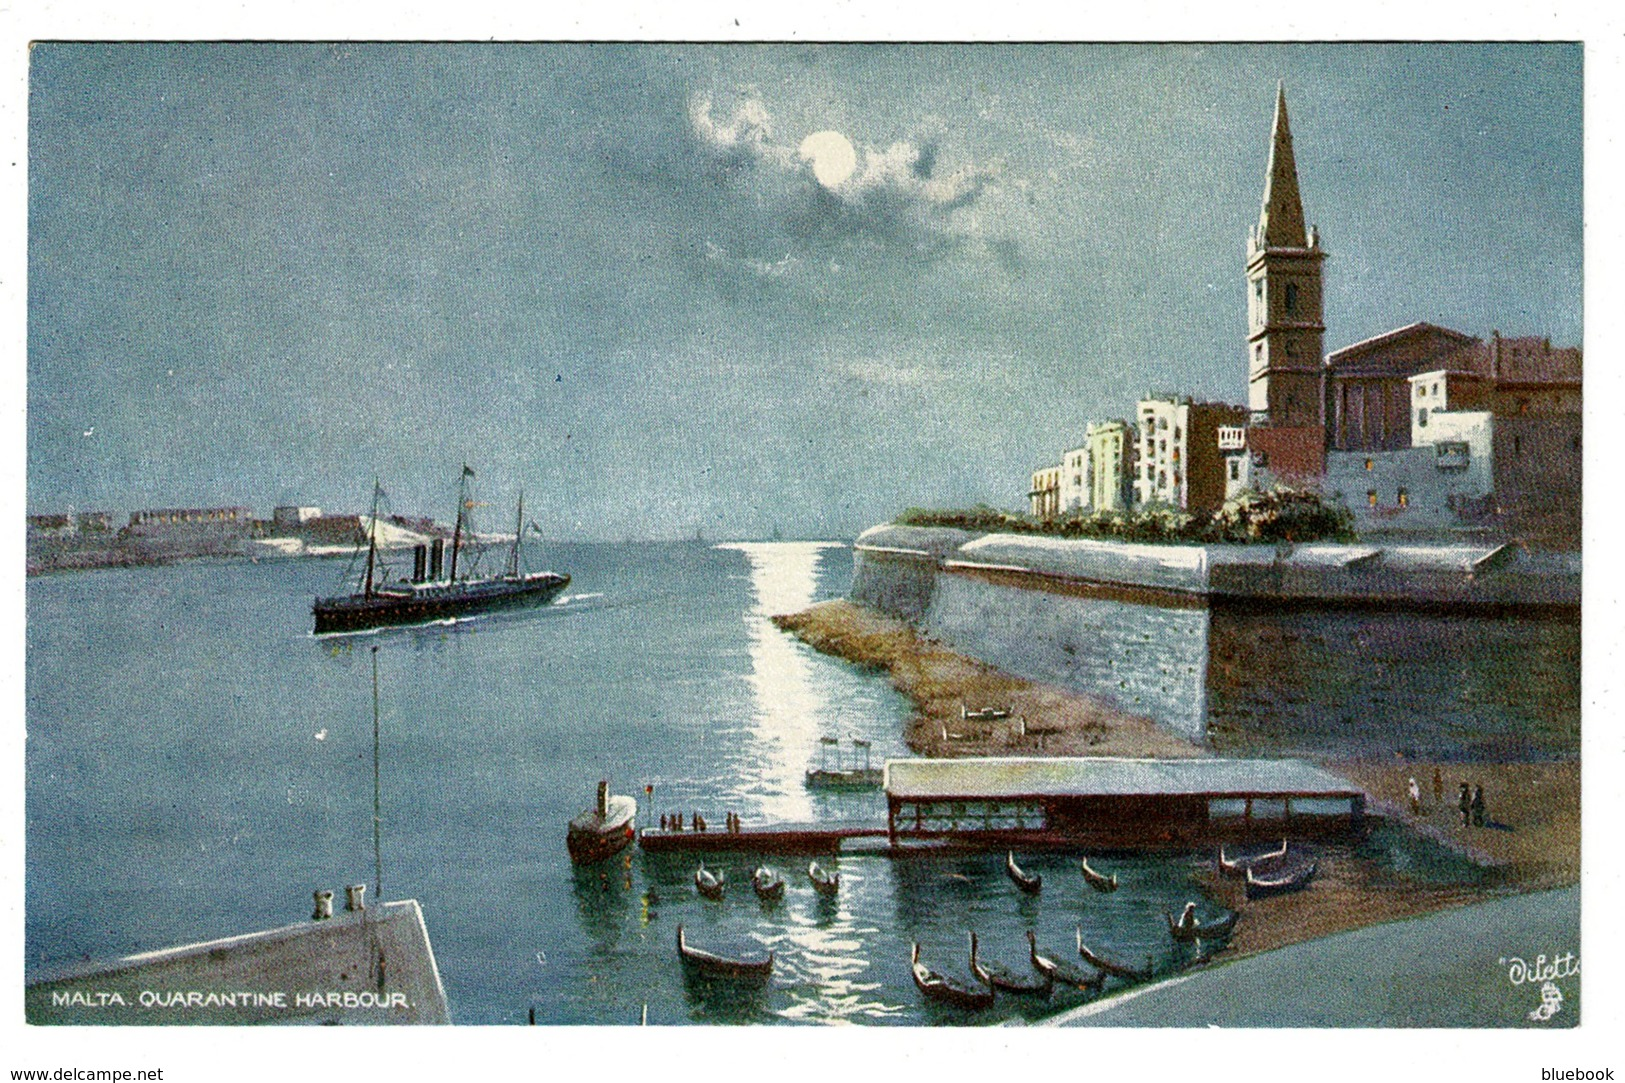 Ref 1325 - Early Raphael Tuck Postcard - Quarantine Harbour Malta - Malta